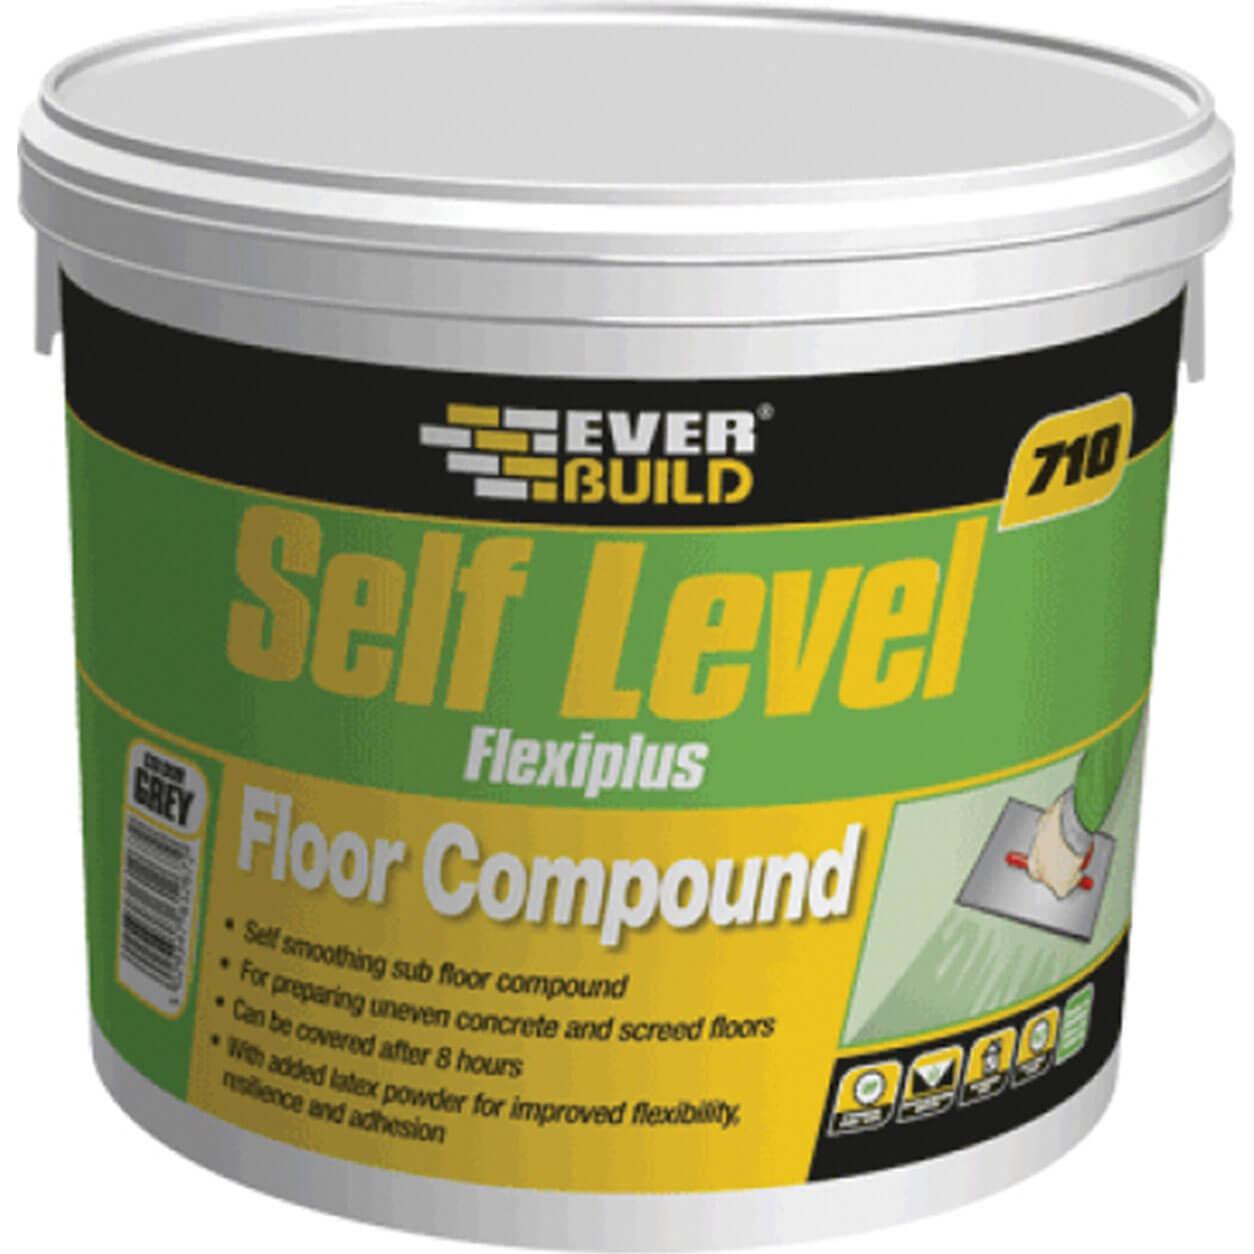 Everbuild 710 Self Level Flexiplus Floor Compound 10kg Tub